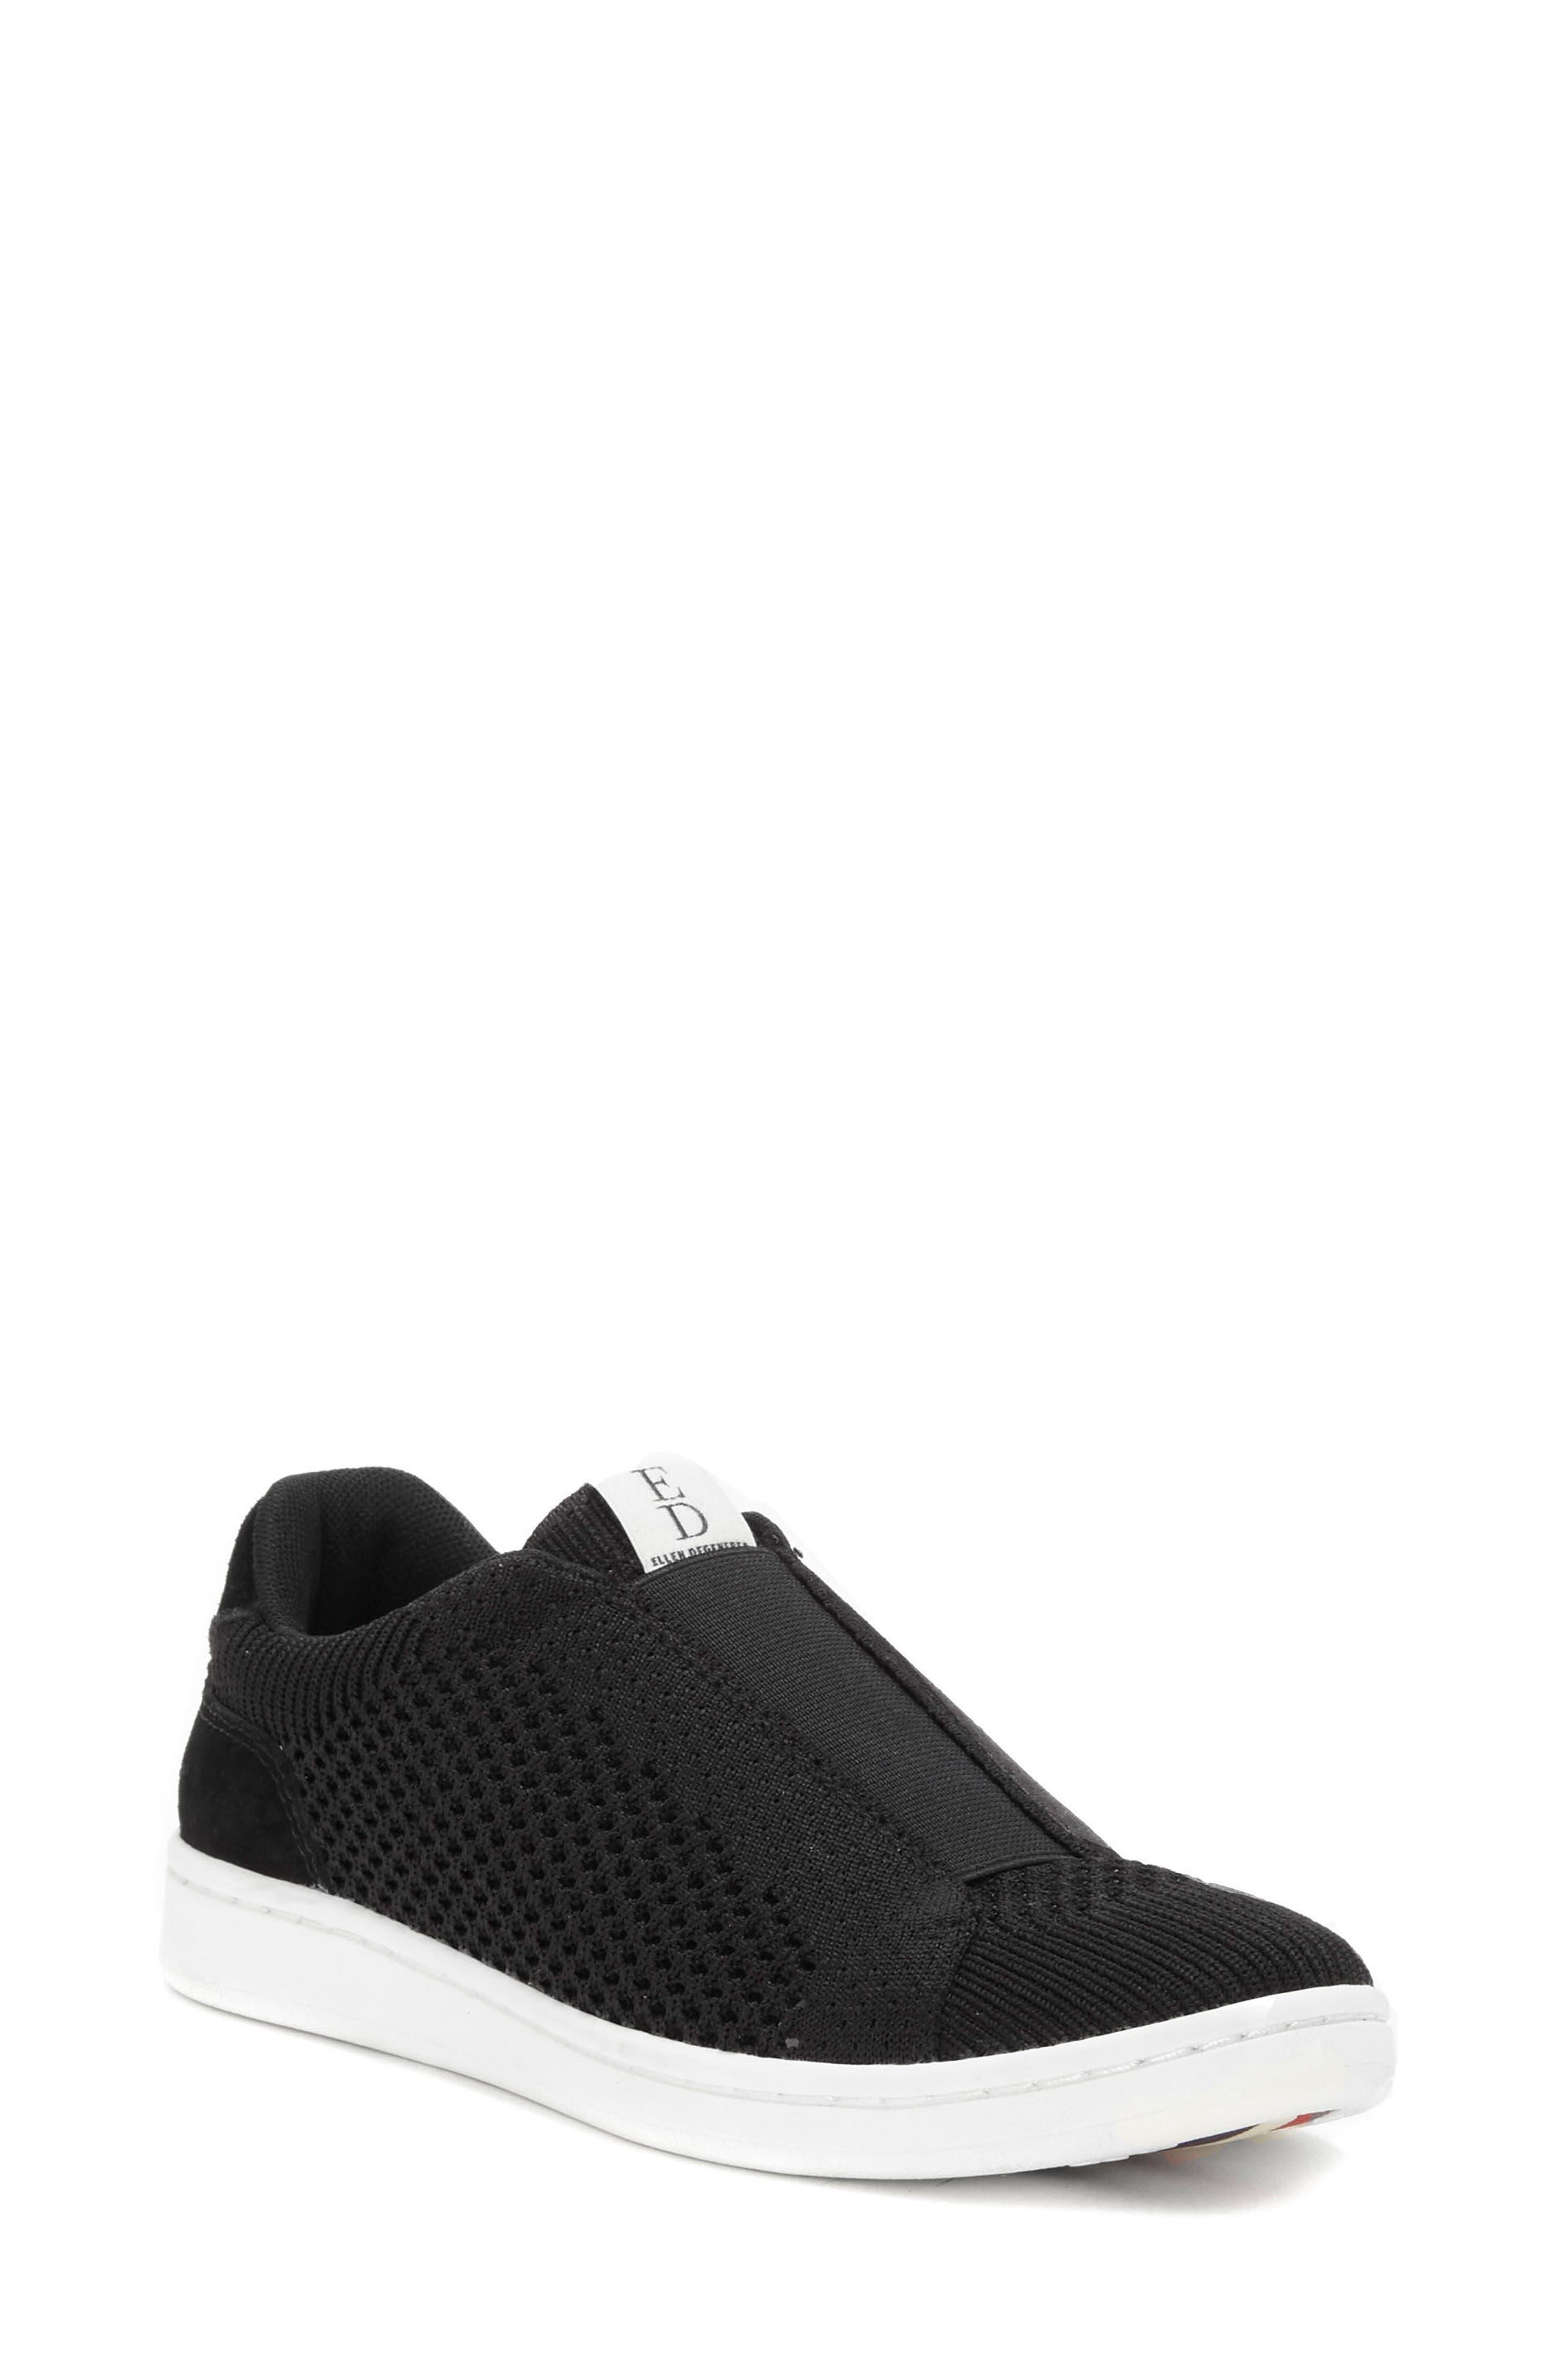 Casbey Slip-On Sneaker,                         Main,                         color, BLACK/ BLACK FABRIC